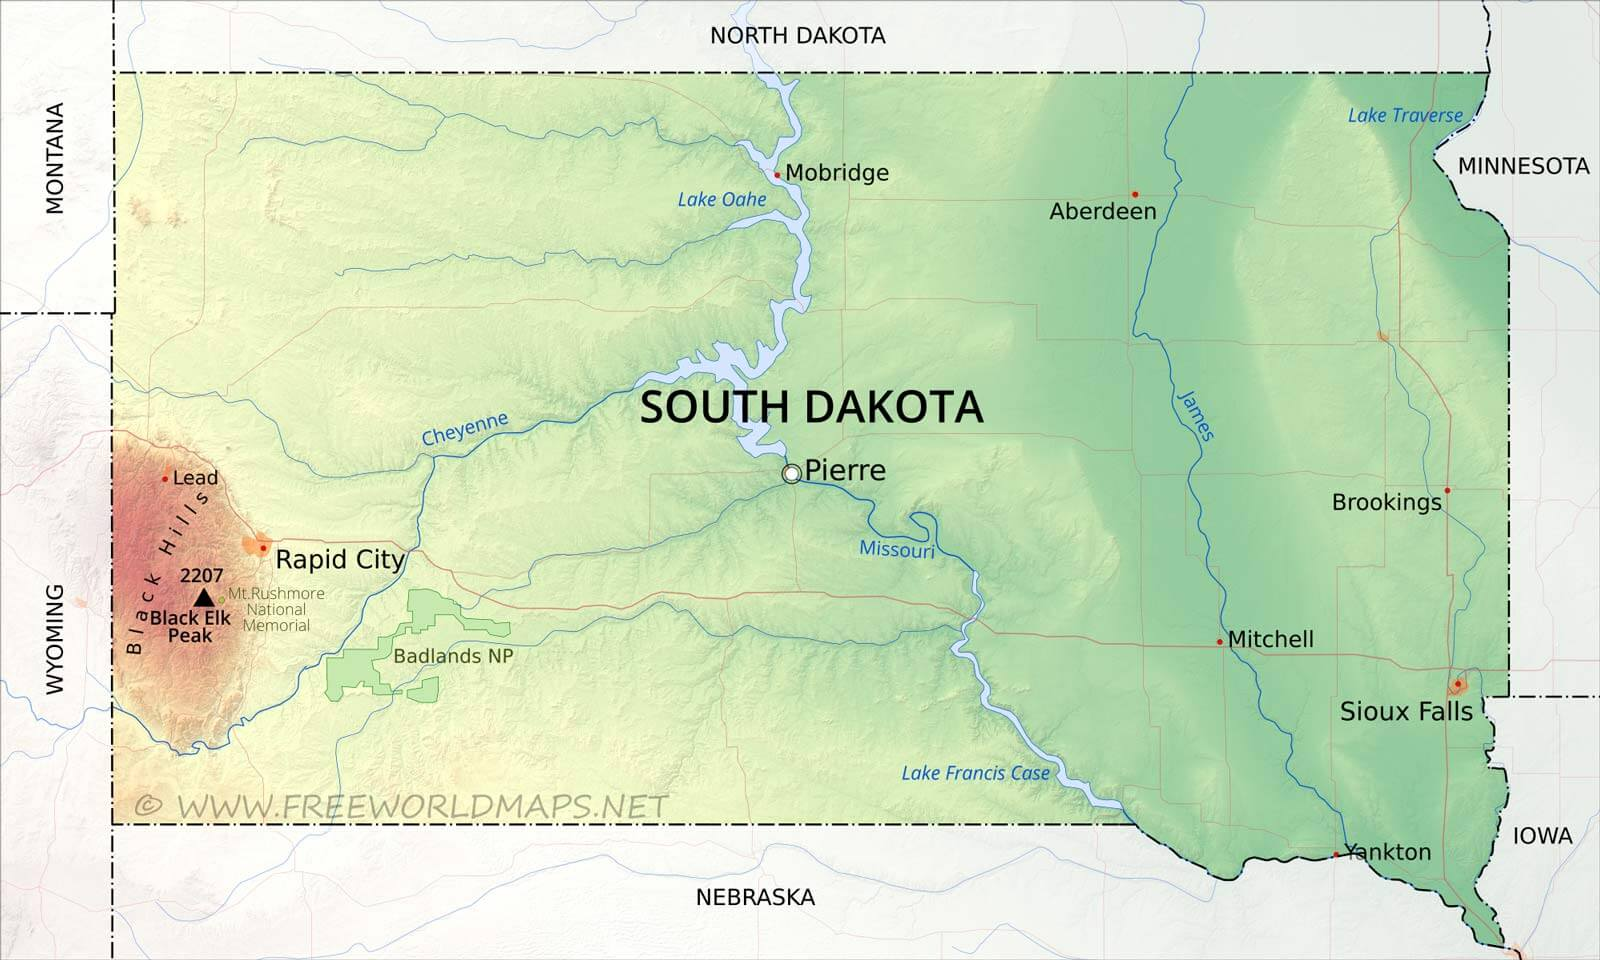 Physical map of South Dakota on map of eastern nc lakes, northeast major lakes, coteau des prairies lakes, map of south dakota and minnesota, map of ne south dakota, map of northeast south dakota, canada lakes, map of north and south dakota, map of south dakota state parks, north dakota lakes, map of iowa and minnesota, black hills south dakota lakes, webster south dakota area lakes, map of waubay, map of lake havasu lake, south dakota glacial lakes, map showing river in south dakota, map of eastern nd, map of se south dakota,